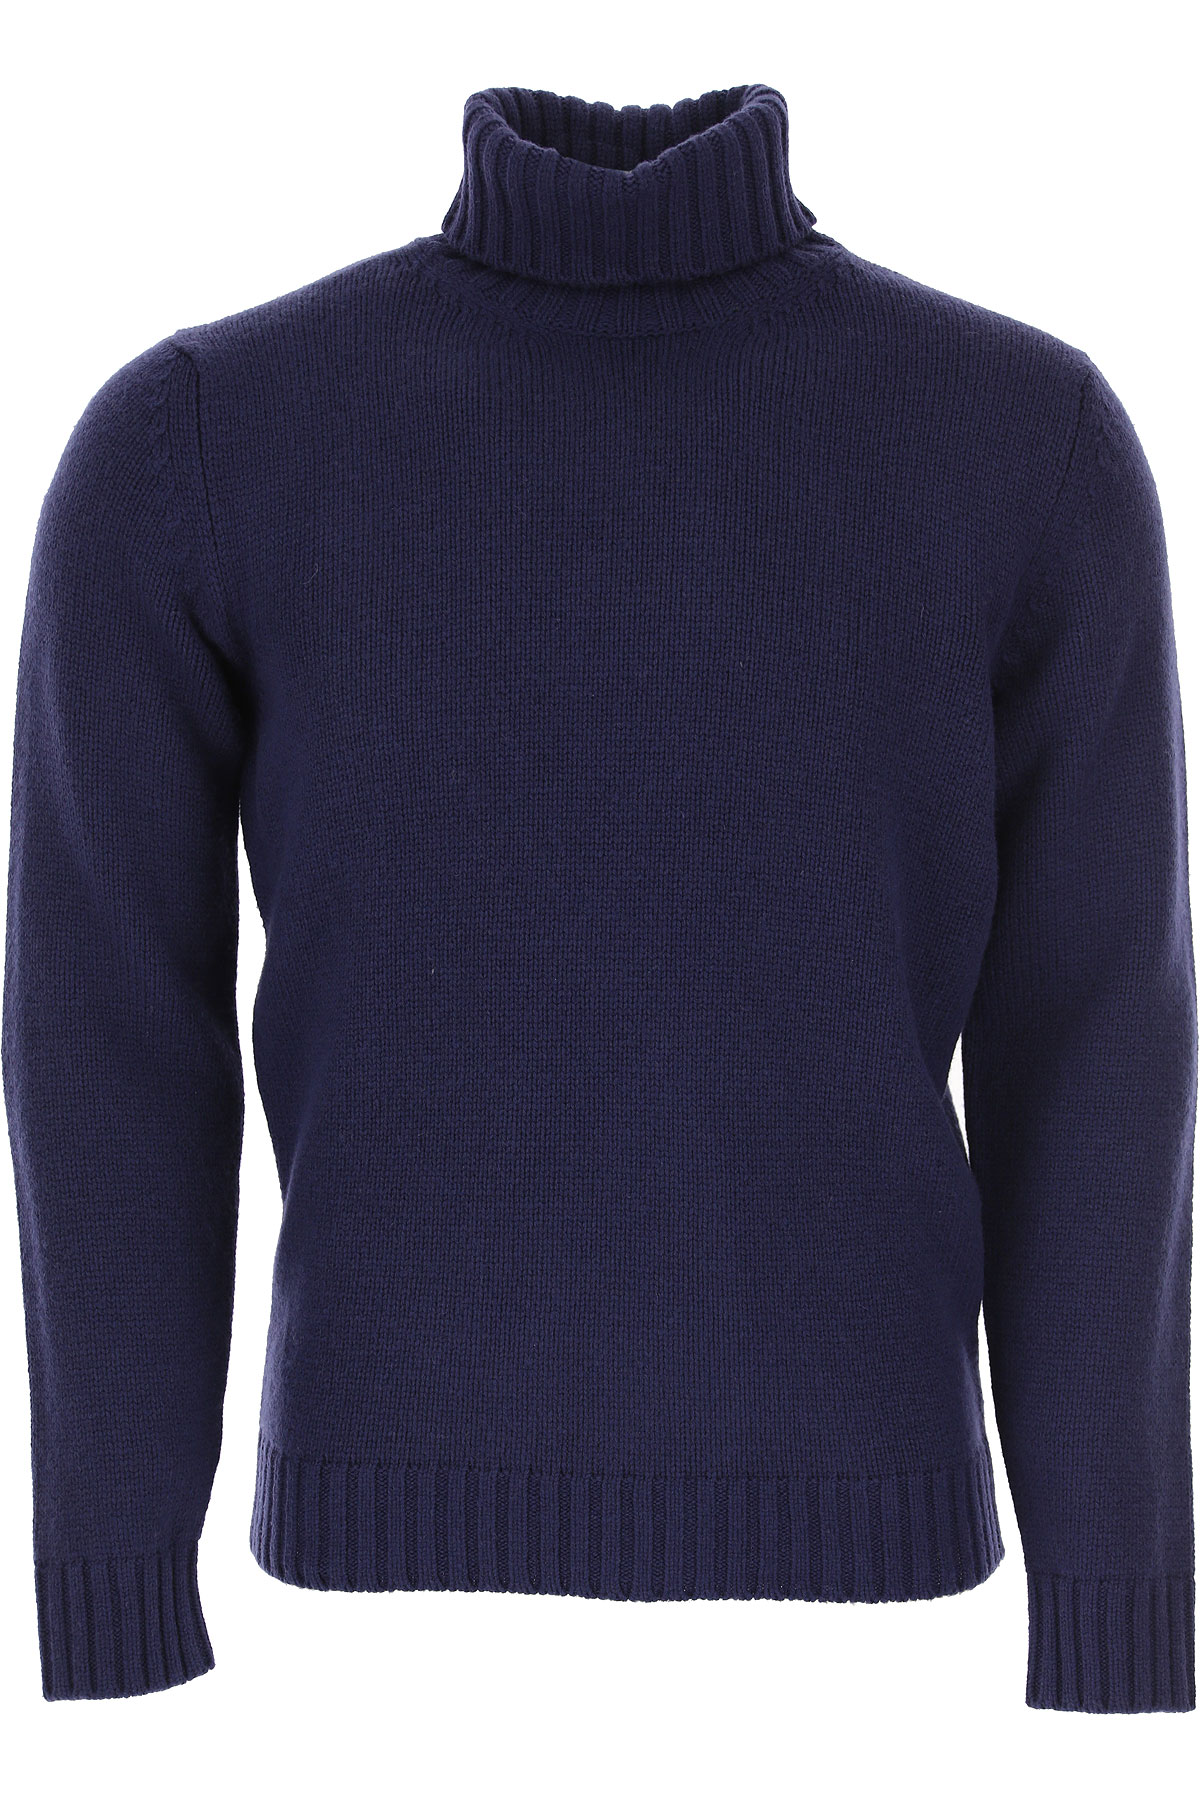 Kangra Sweater for Men Jumper On Sale, Navy Blue, Merinos Wool, 2019, L XL XXL